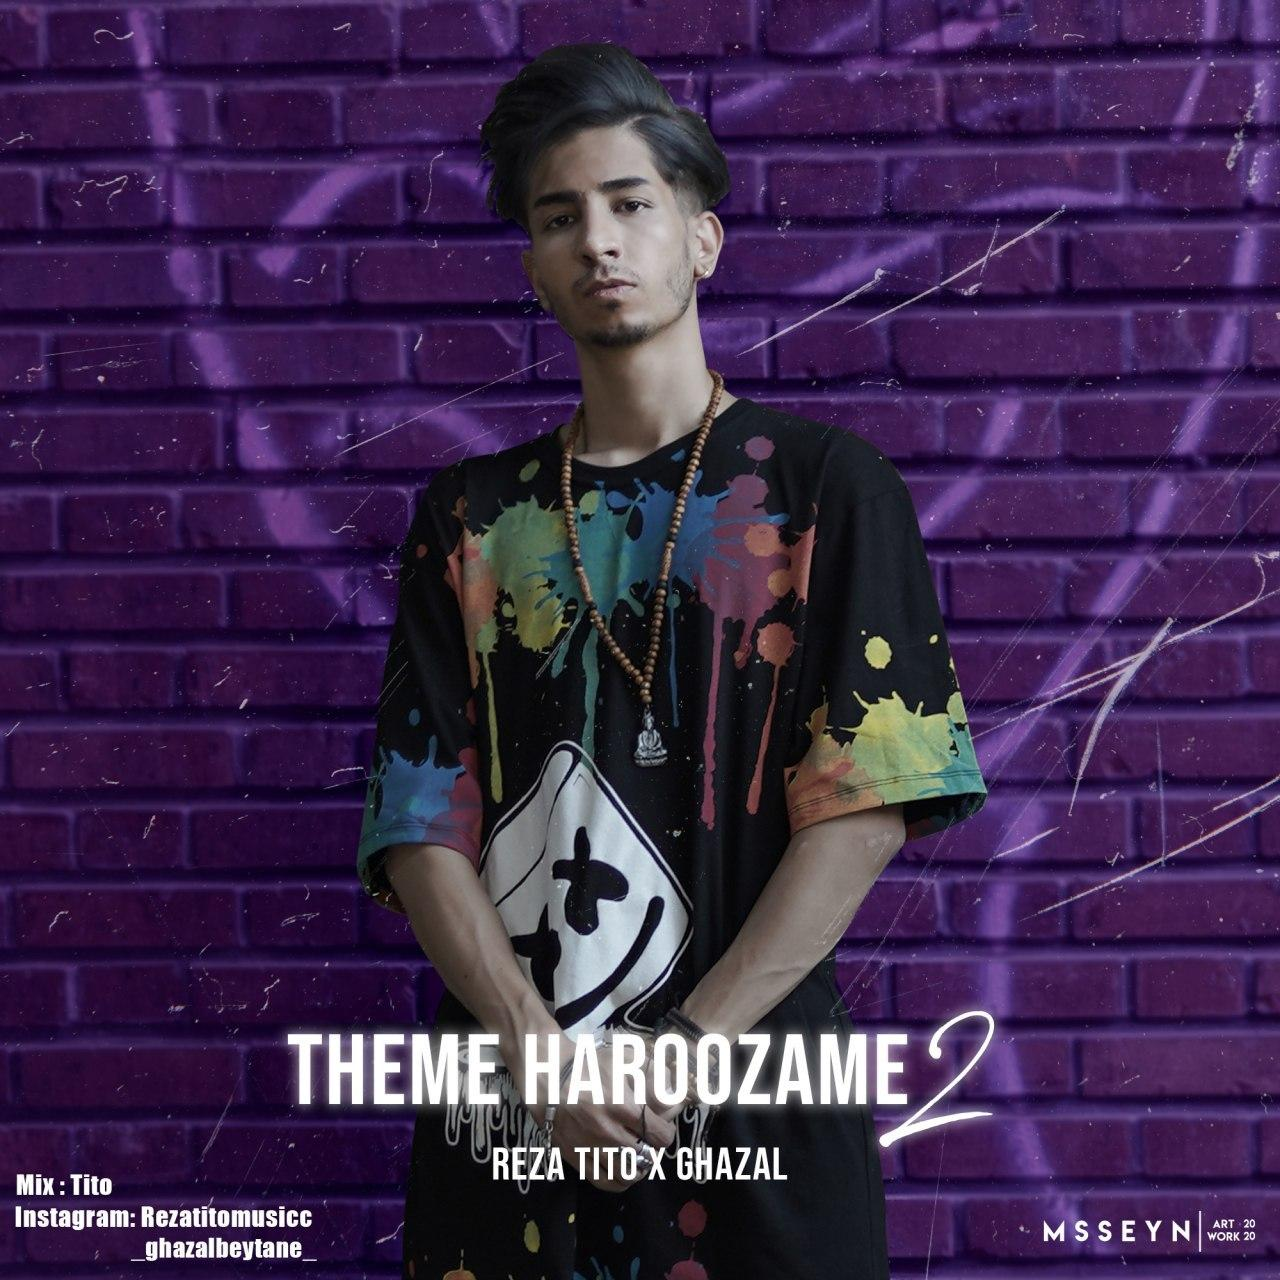 Reza Tito – Theme Haroozame 2